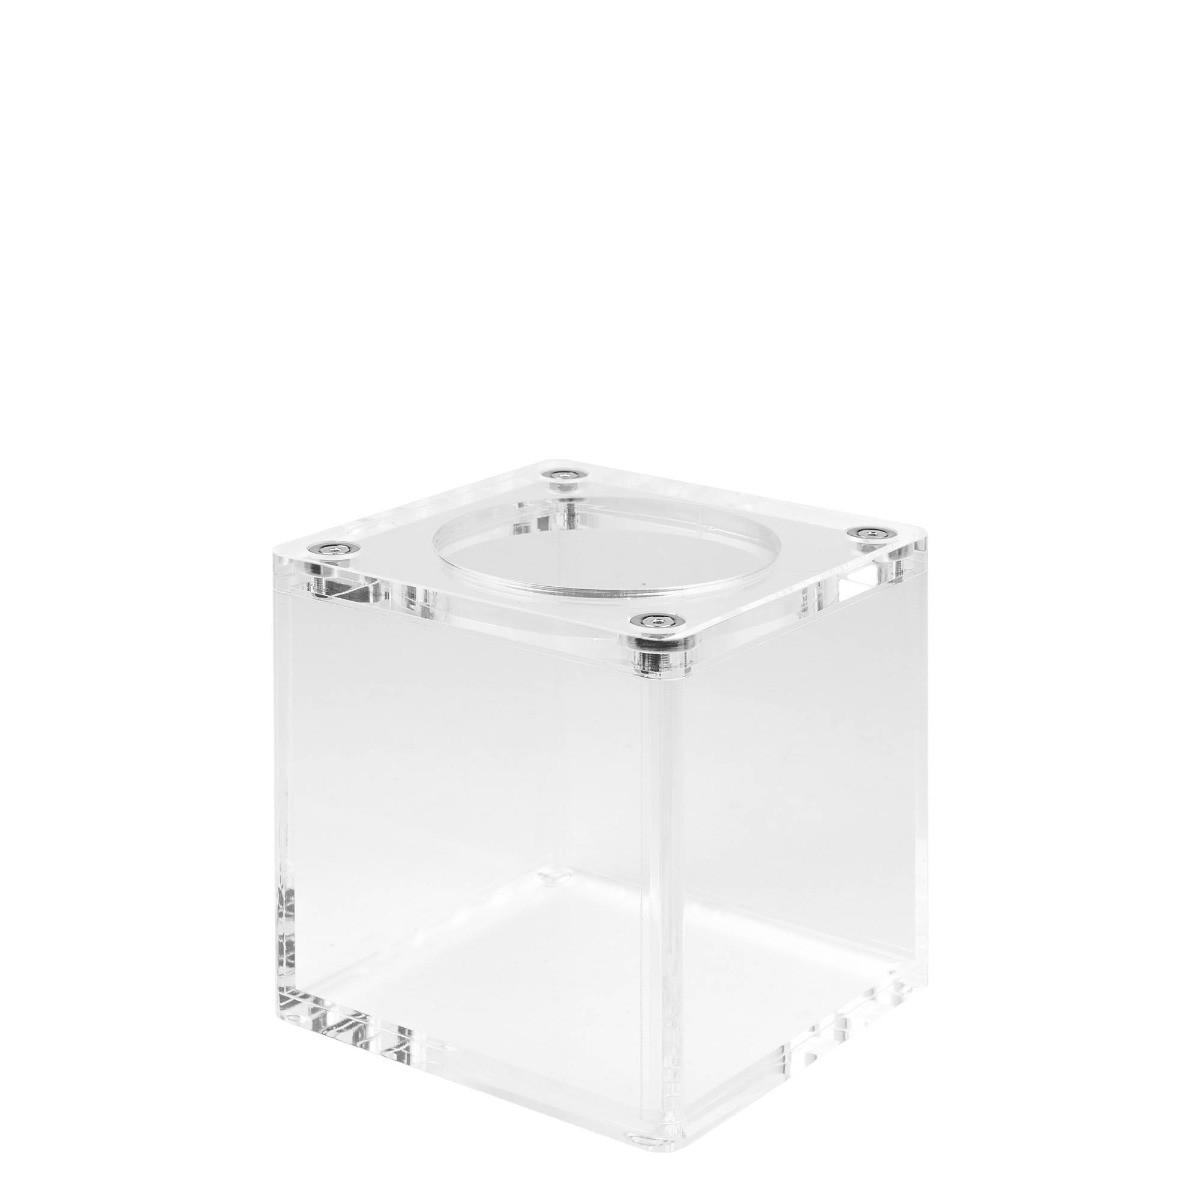 Hoob Cube Mini Распродажа | Колба для кальяна subAtom